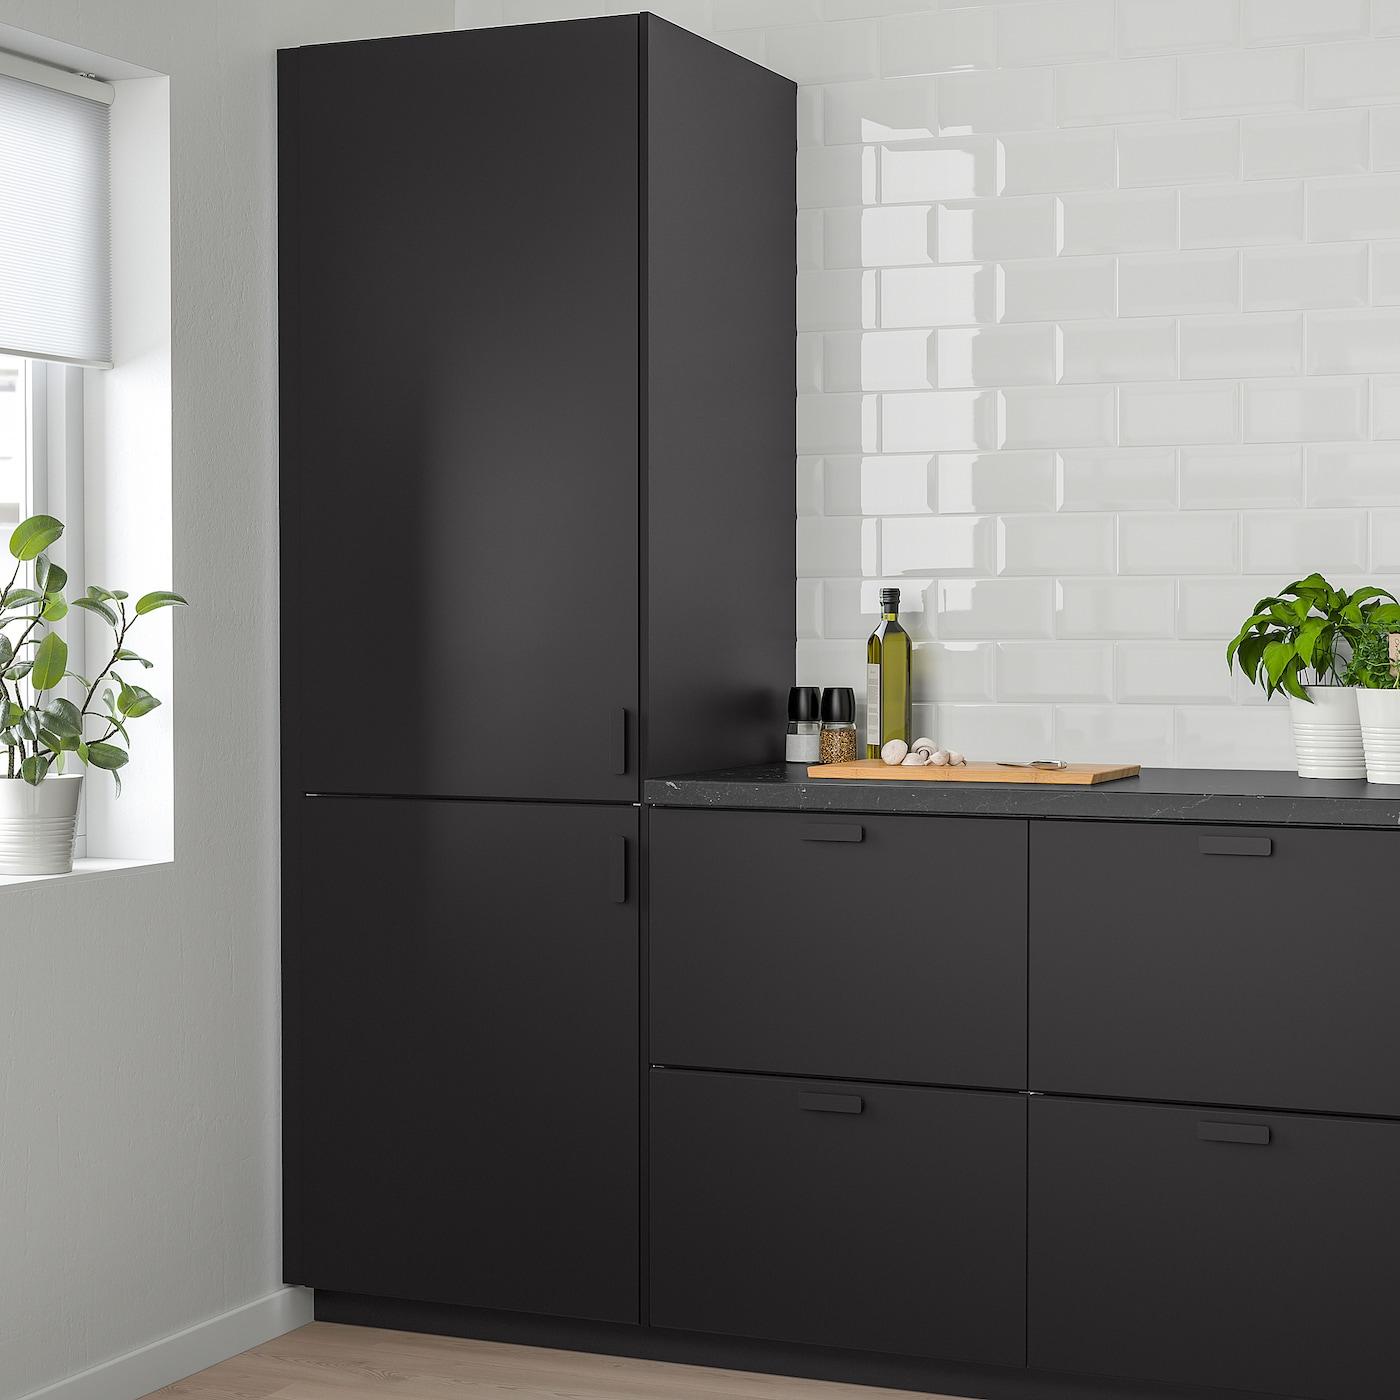 Kungsbacka Porte Anthracite 60x60 Cm Ikea